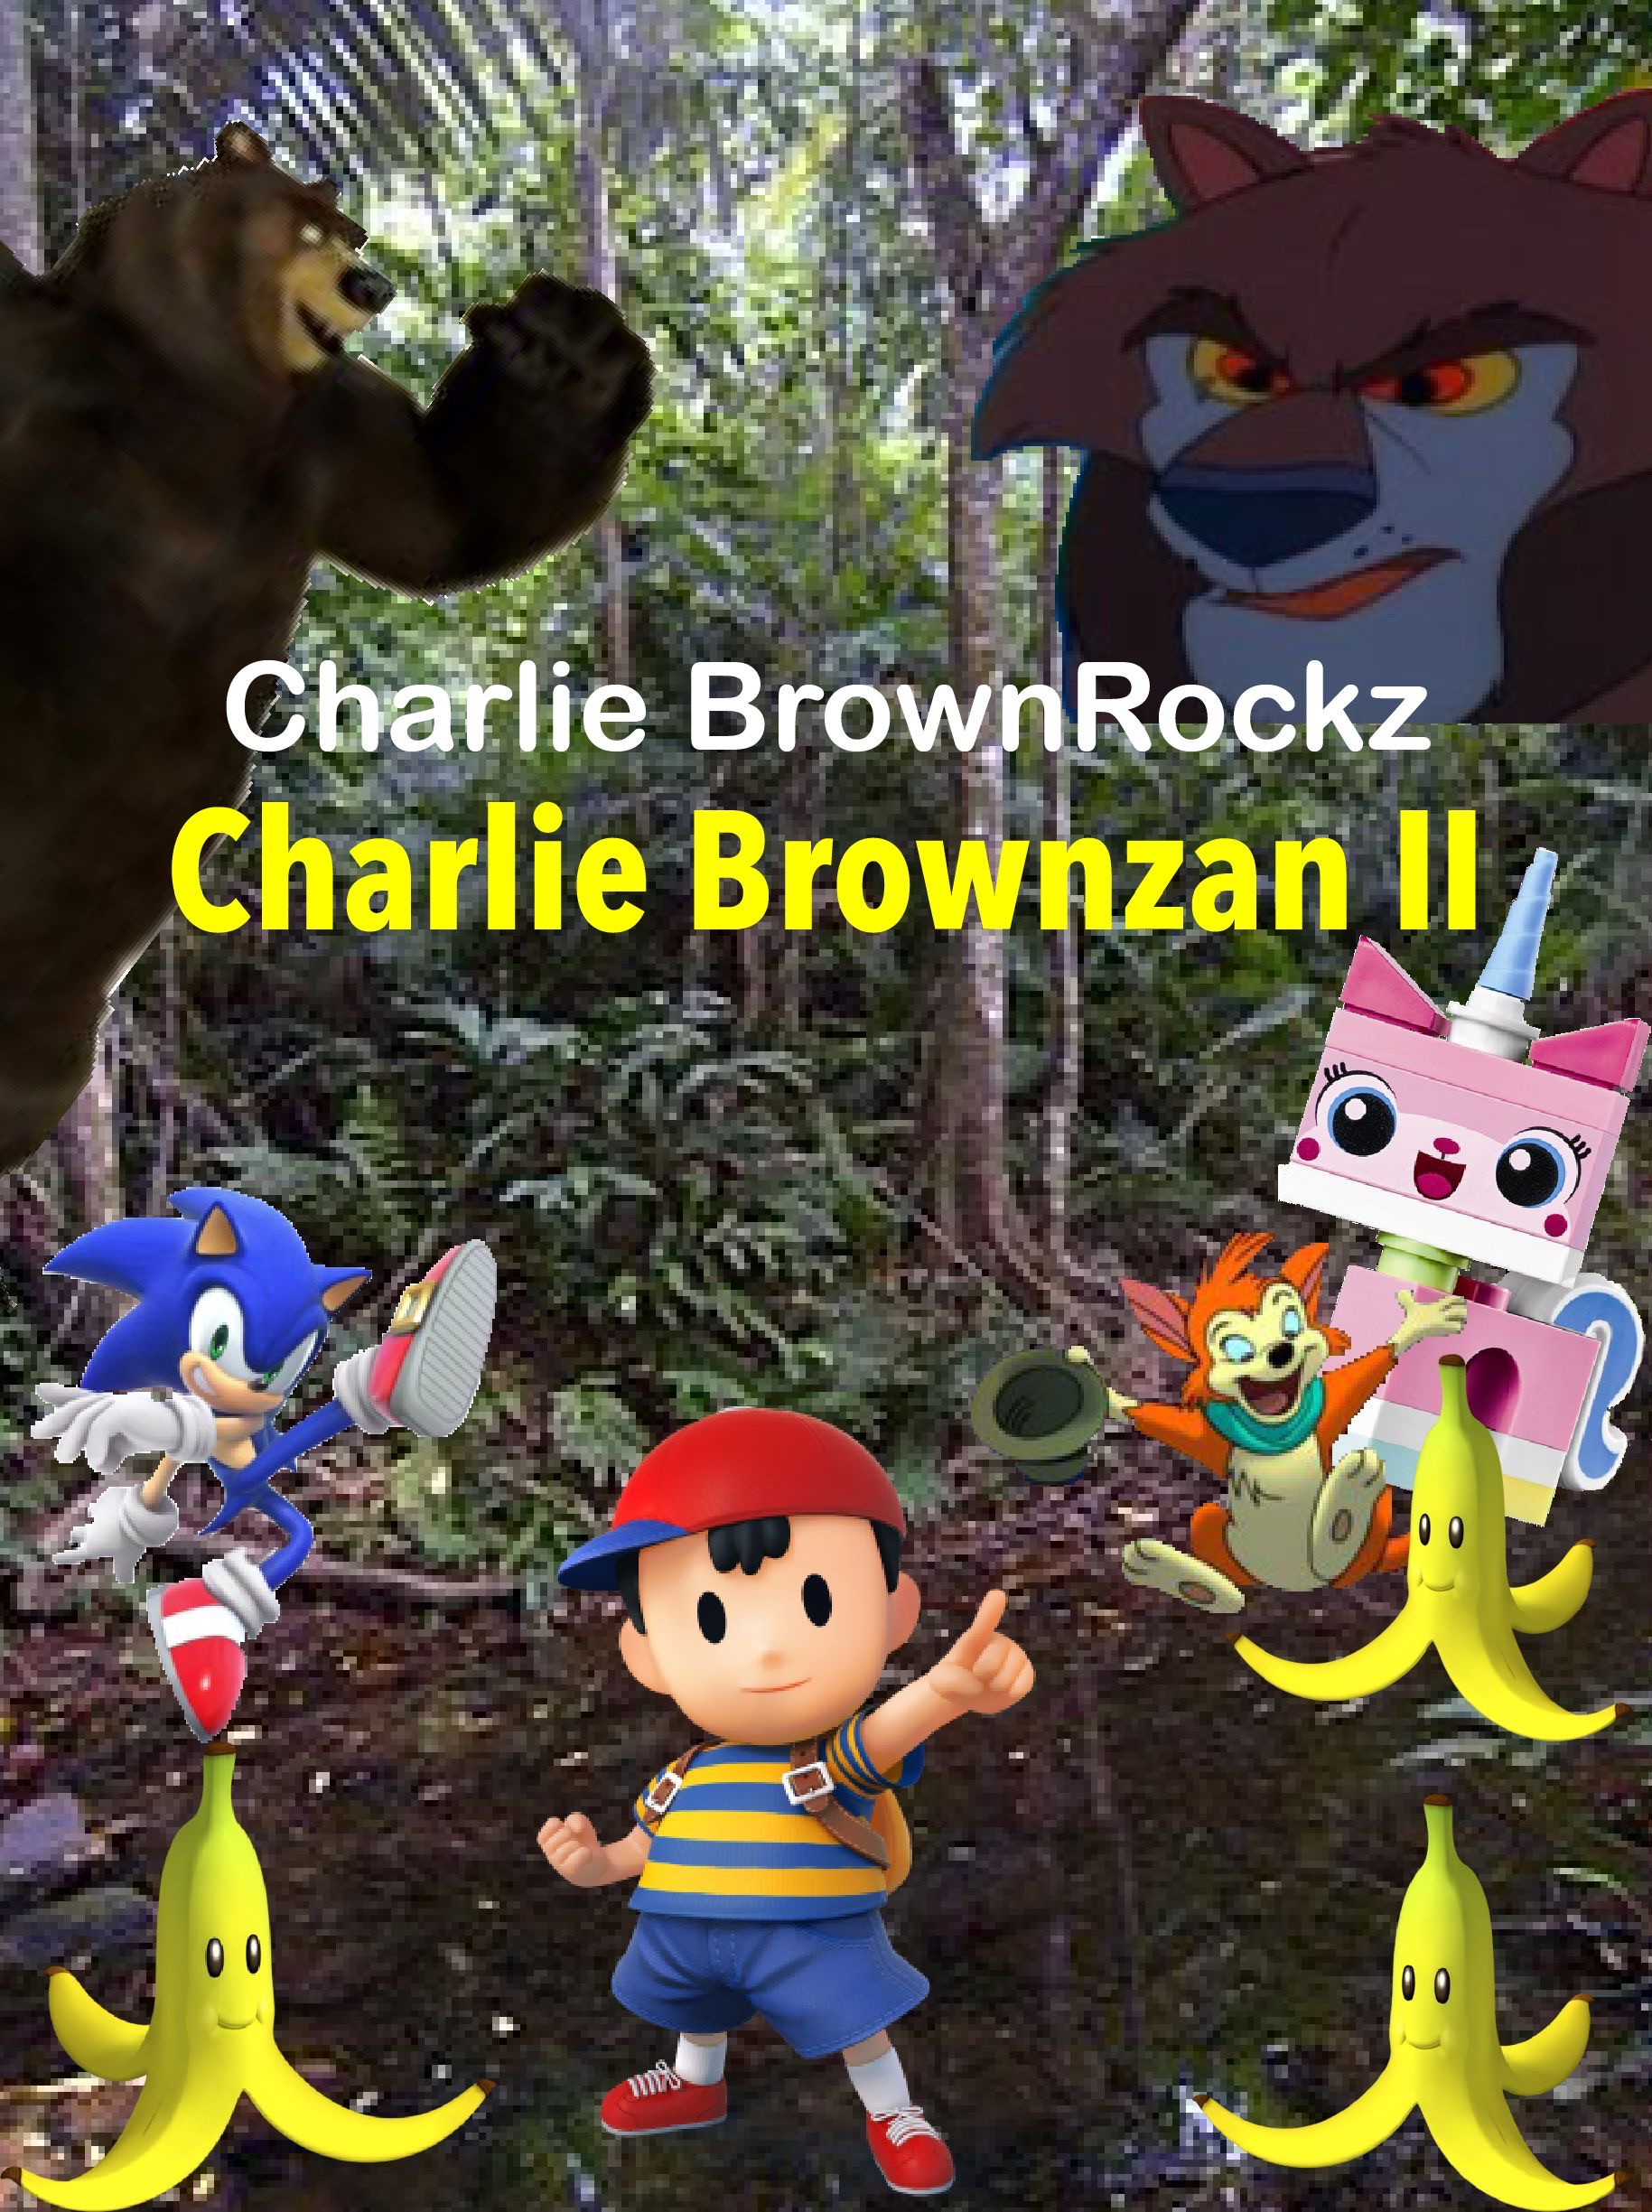 Charlie Brownzan II